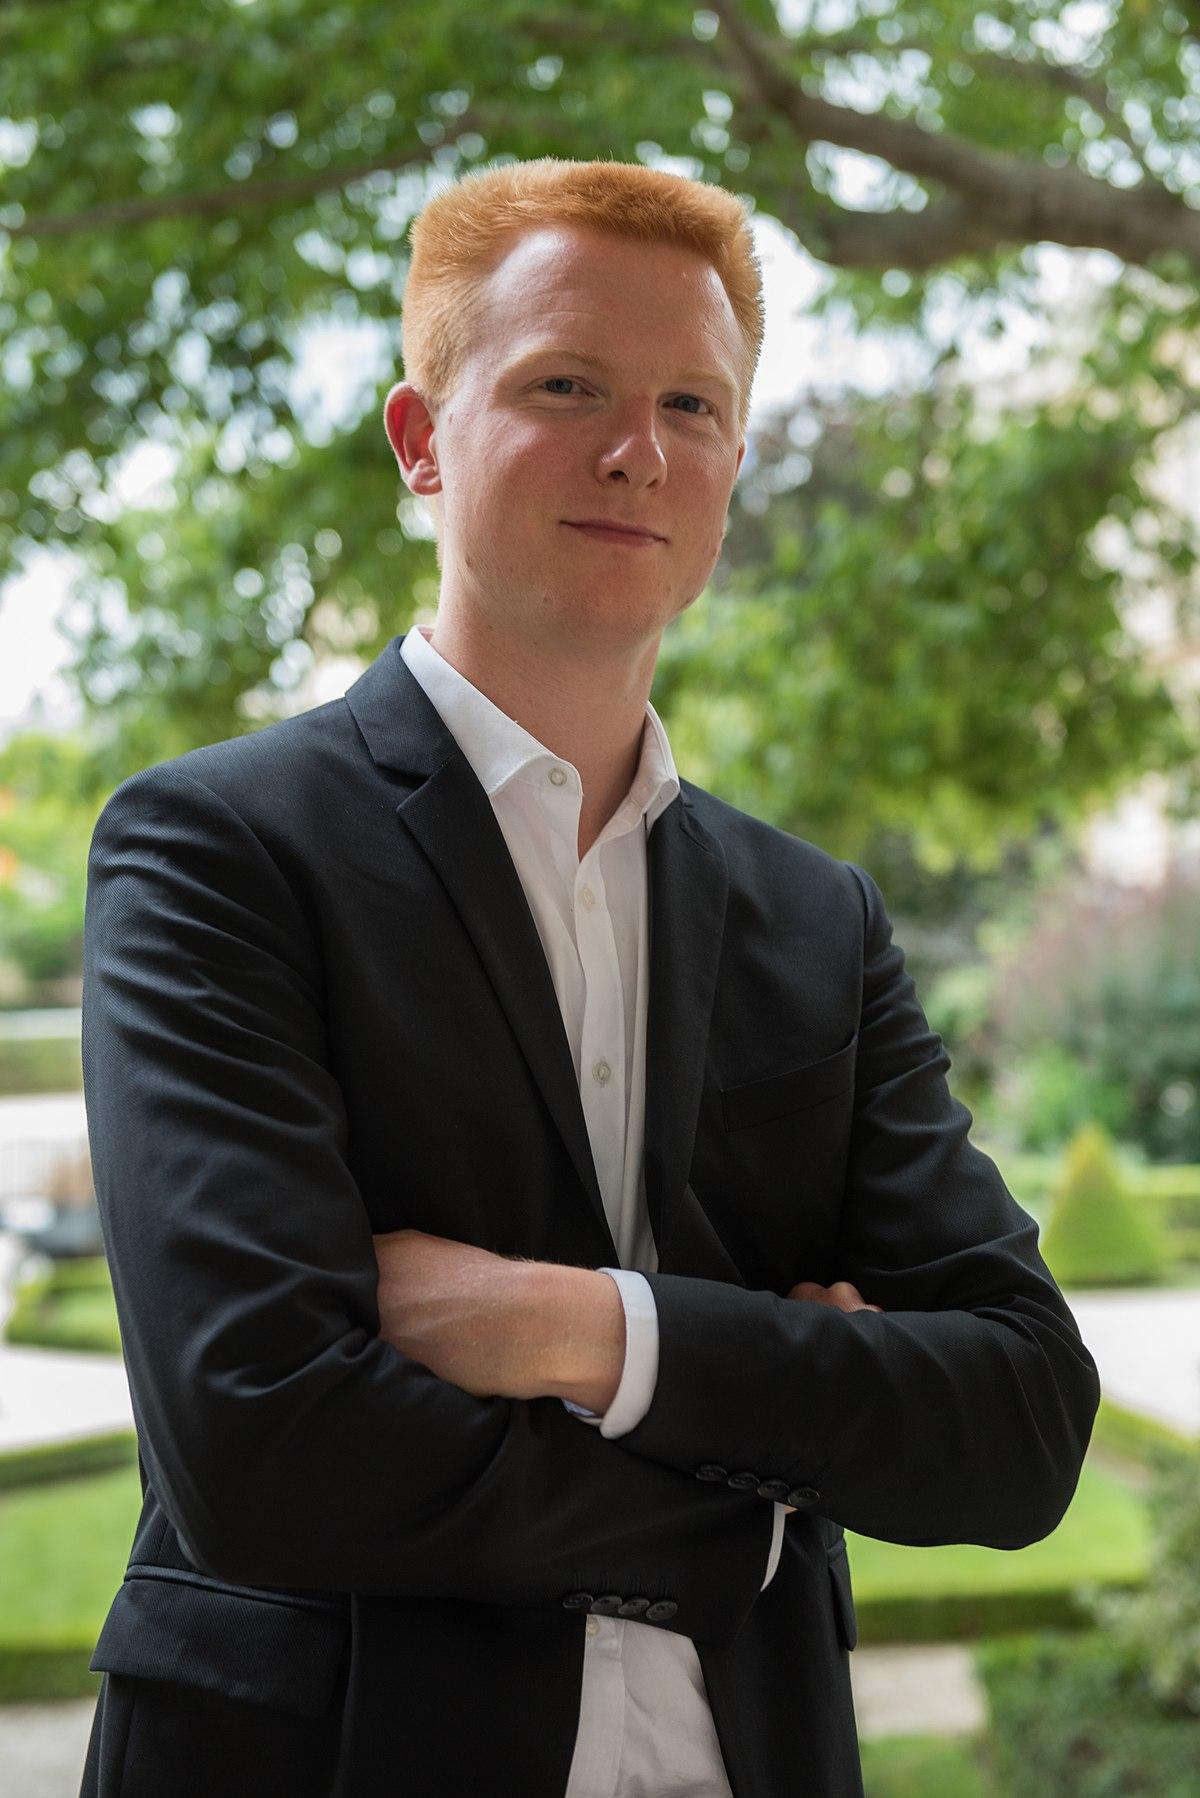 Adrien Quatennens élection presidentielle 2022, candidat